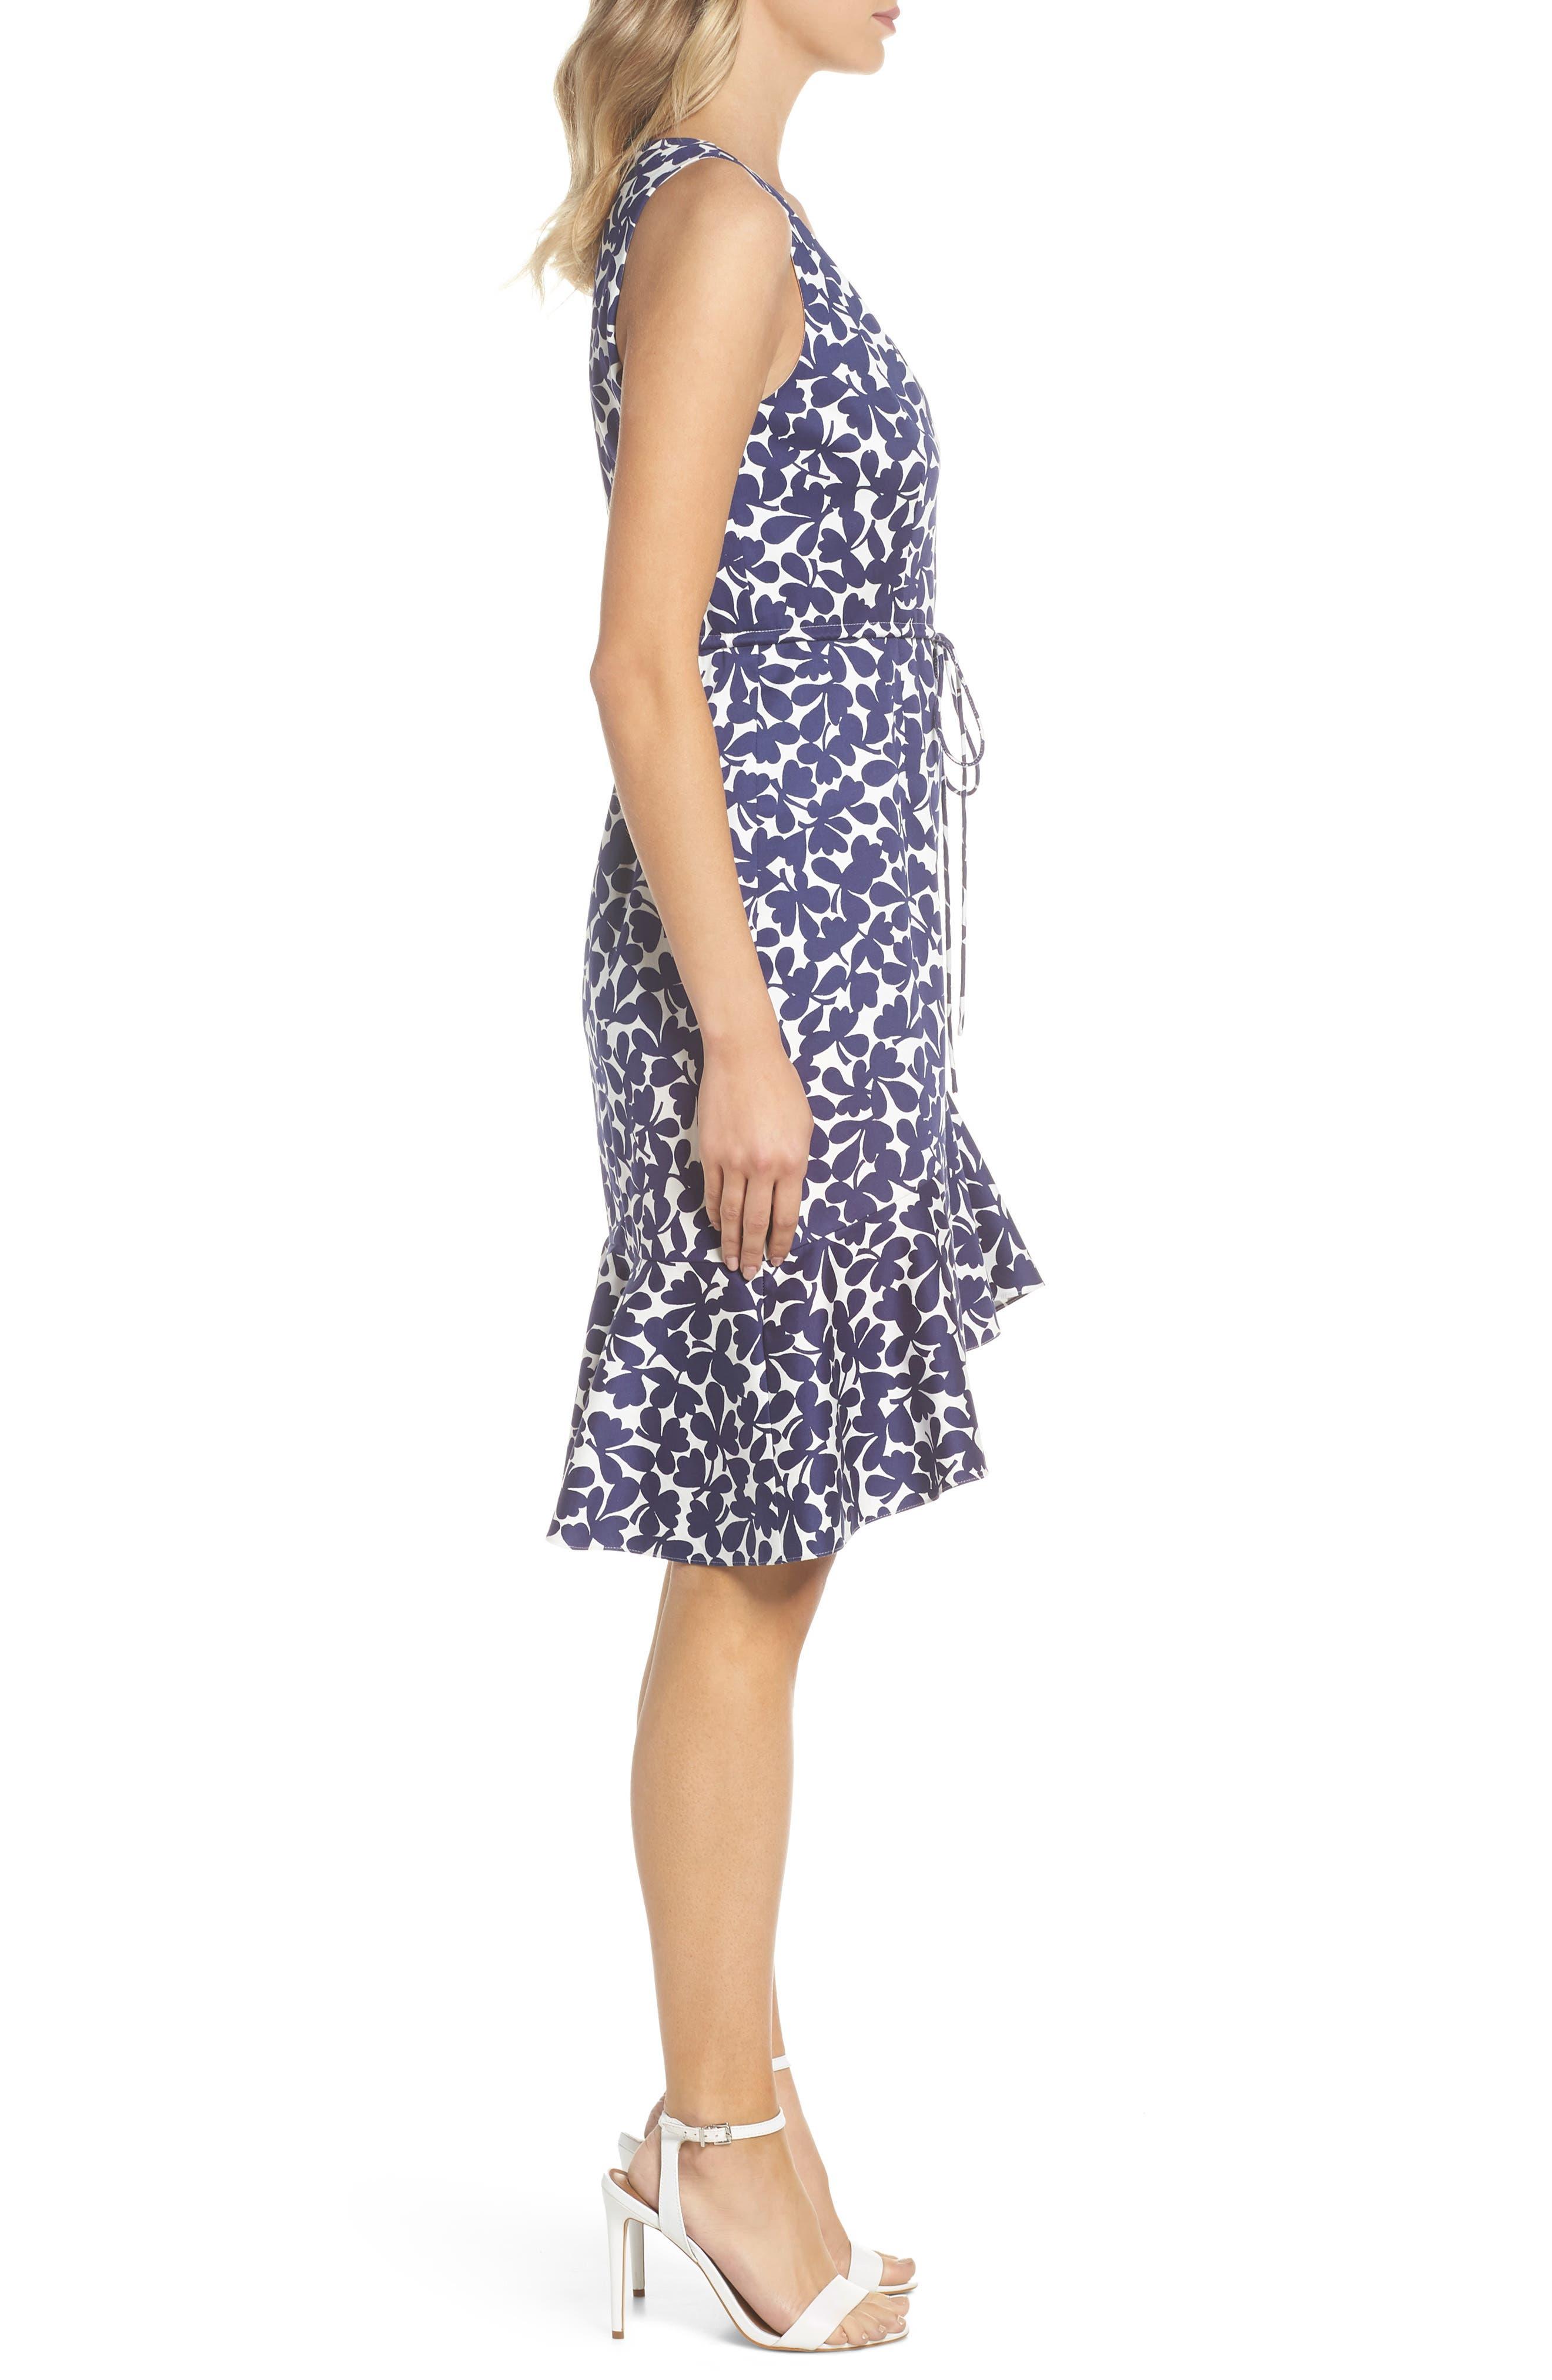 Lady Luck Print Cotton Sateen Dress,                             Alternate thumbnail 3, color,                             Navy/ Ivory